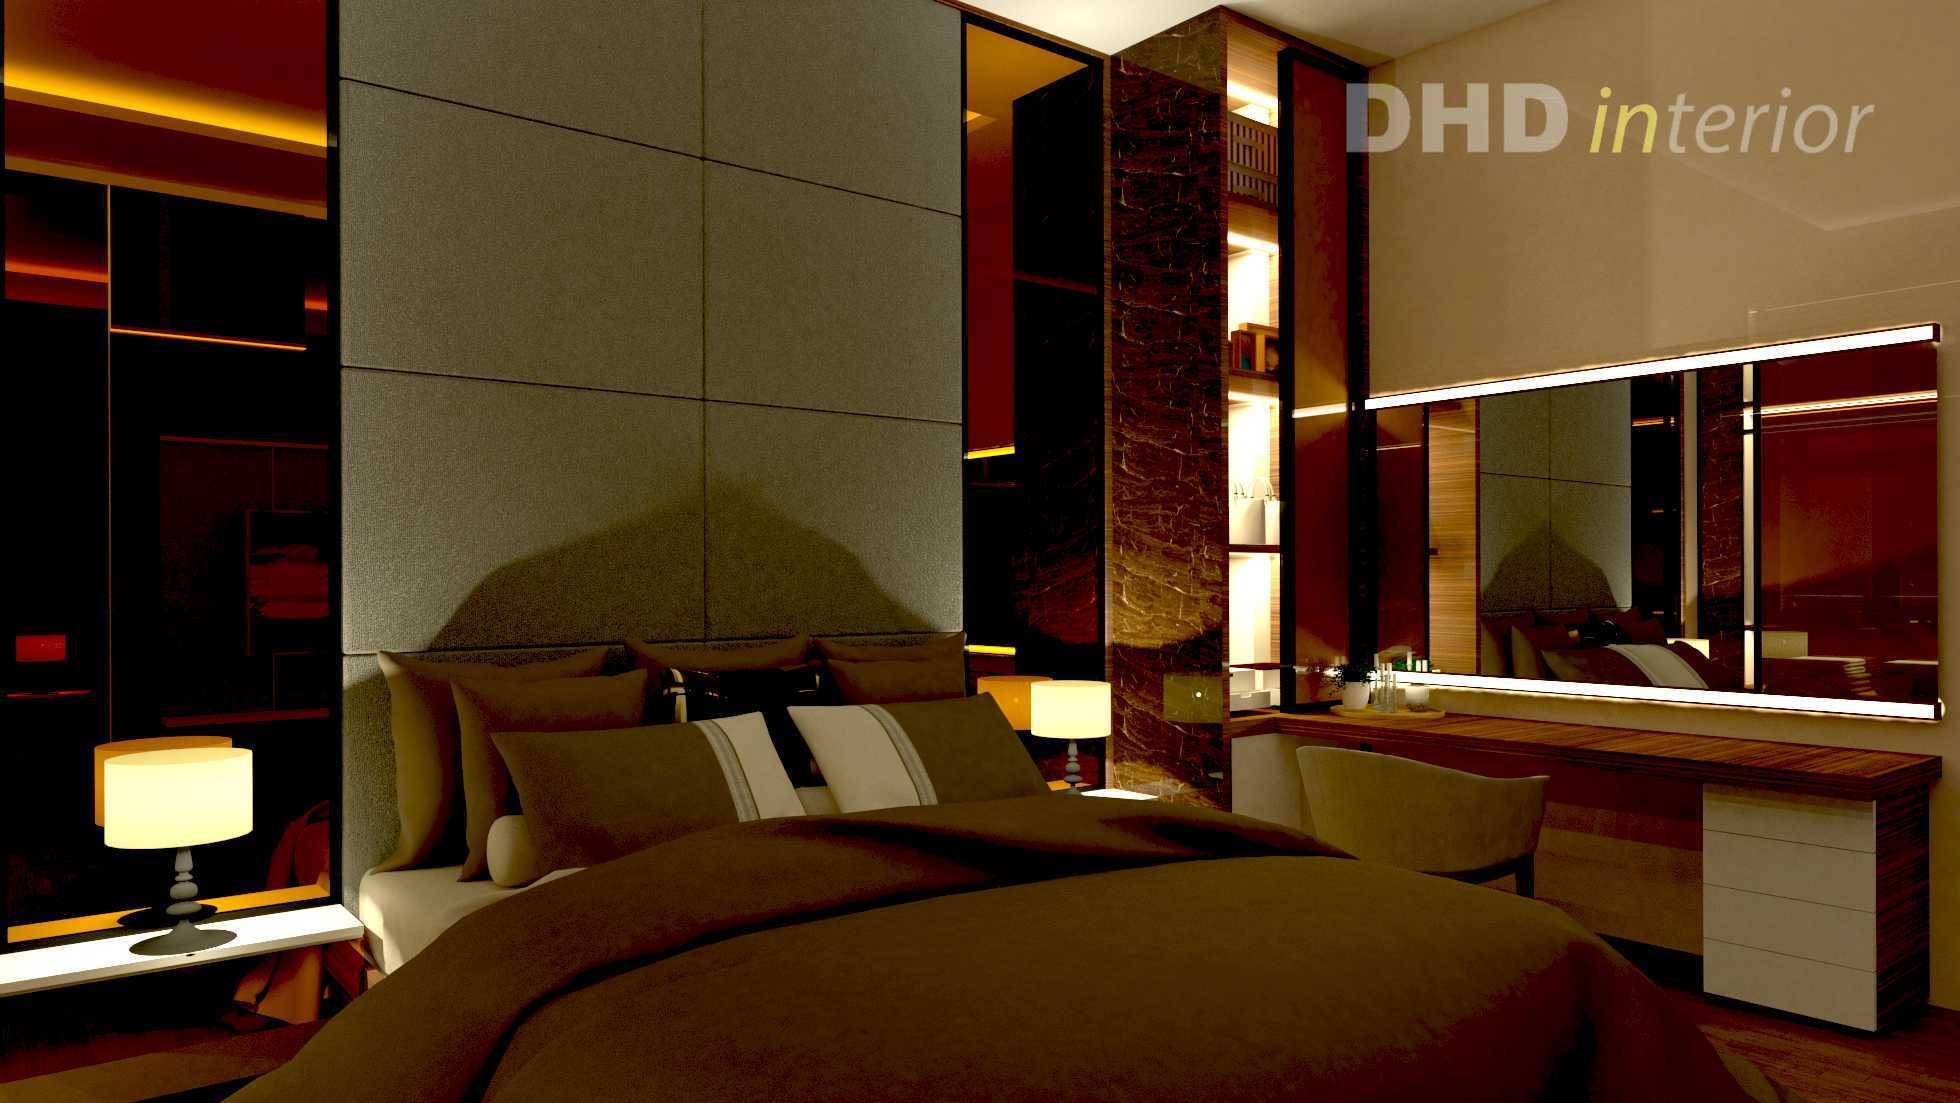 Dhd Interior Luxury Bedroom Pontianak, Kota Pontianak, Kalimantan Barat, Indonesia Pontianak, Kota Pontianak, Kalimantan Barat, Indonesia Bedroom Modern  43214